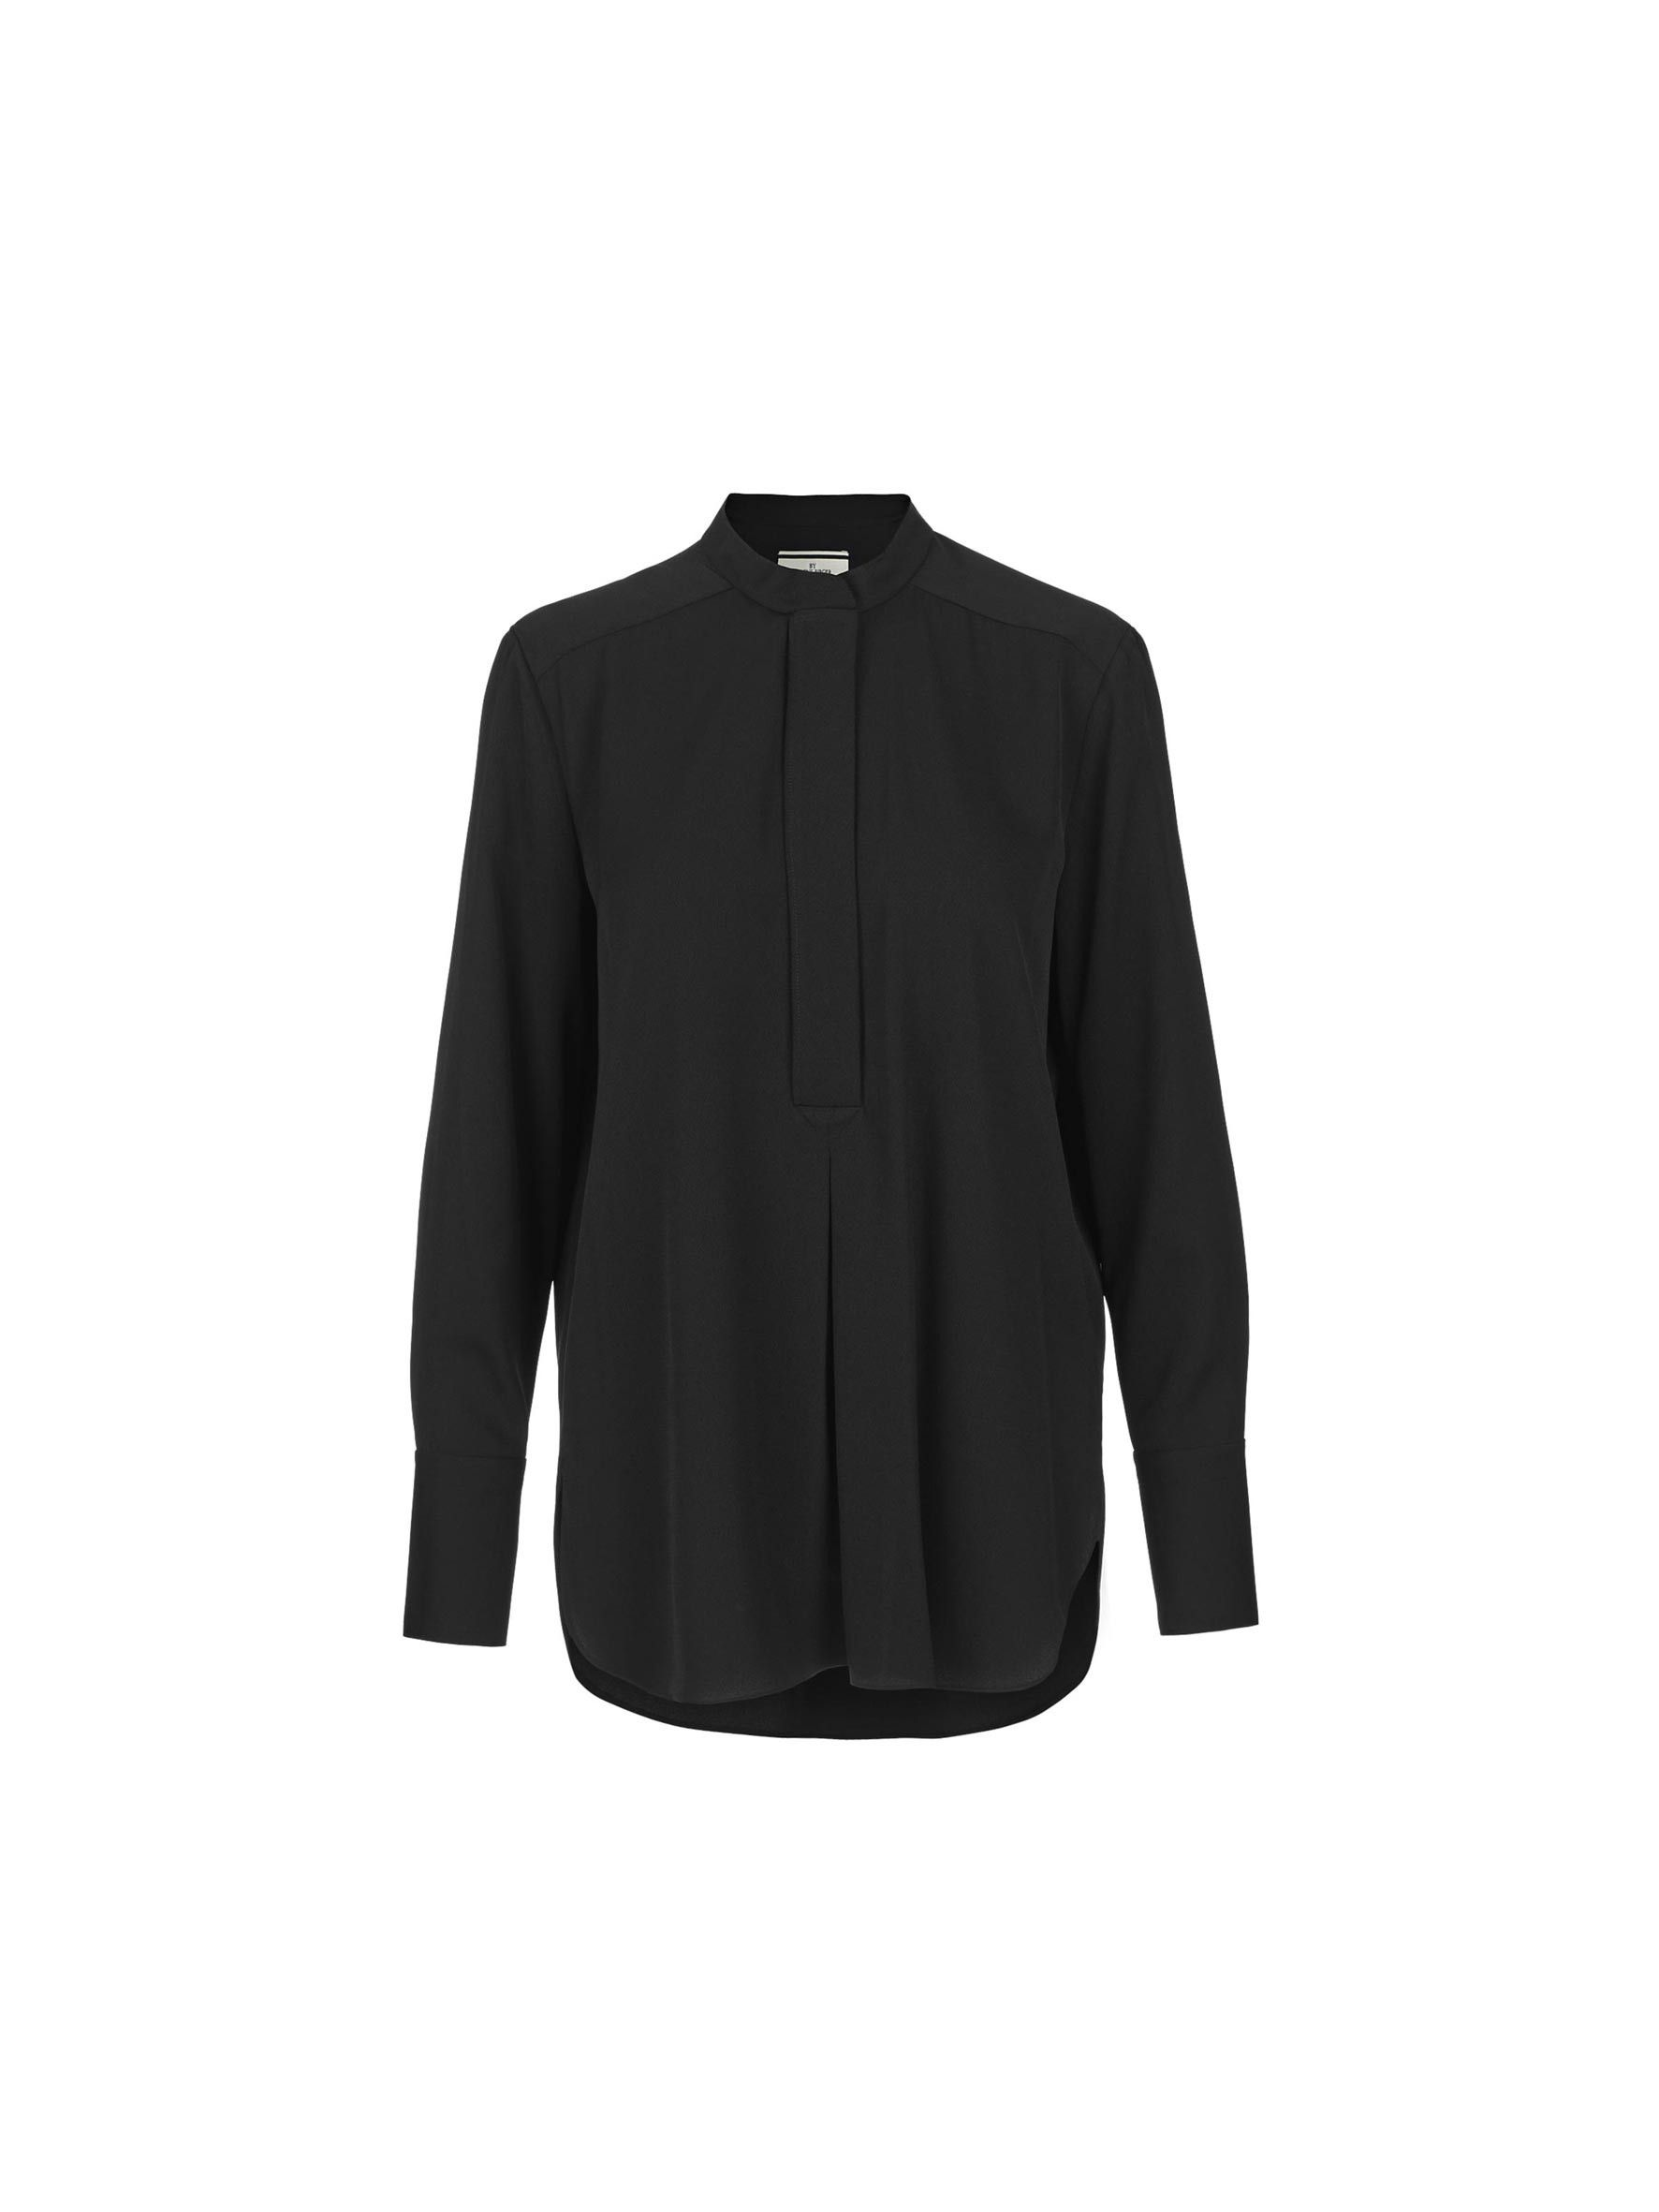 Violeas Long Shirt   By Malene Birger